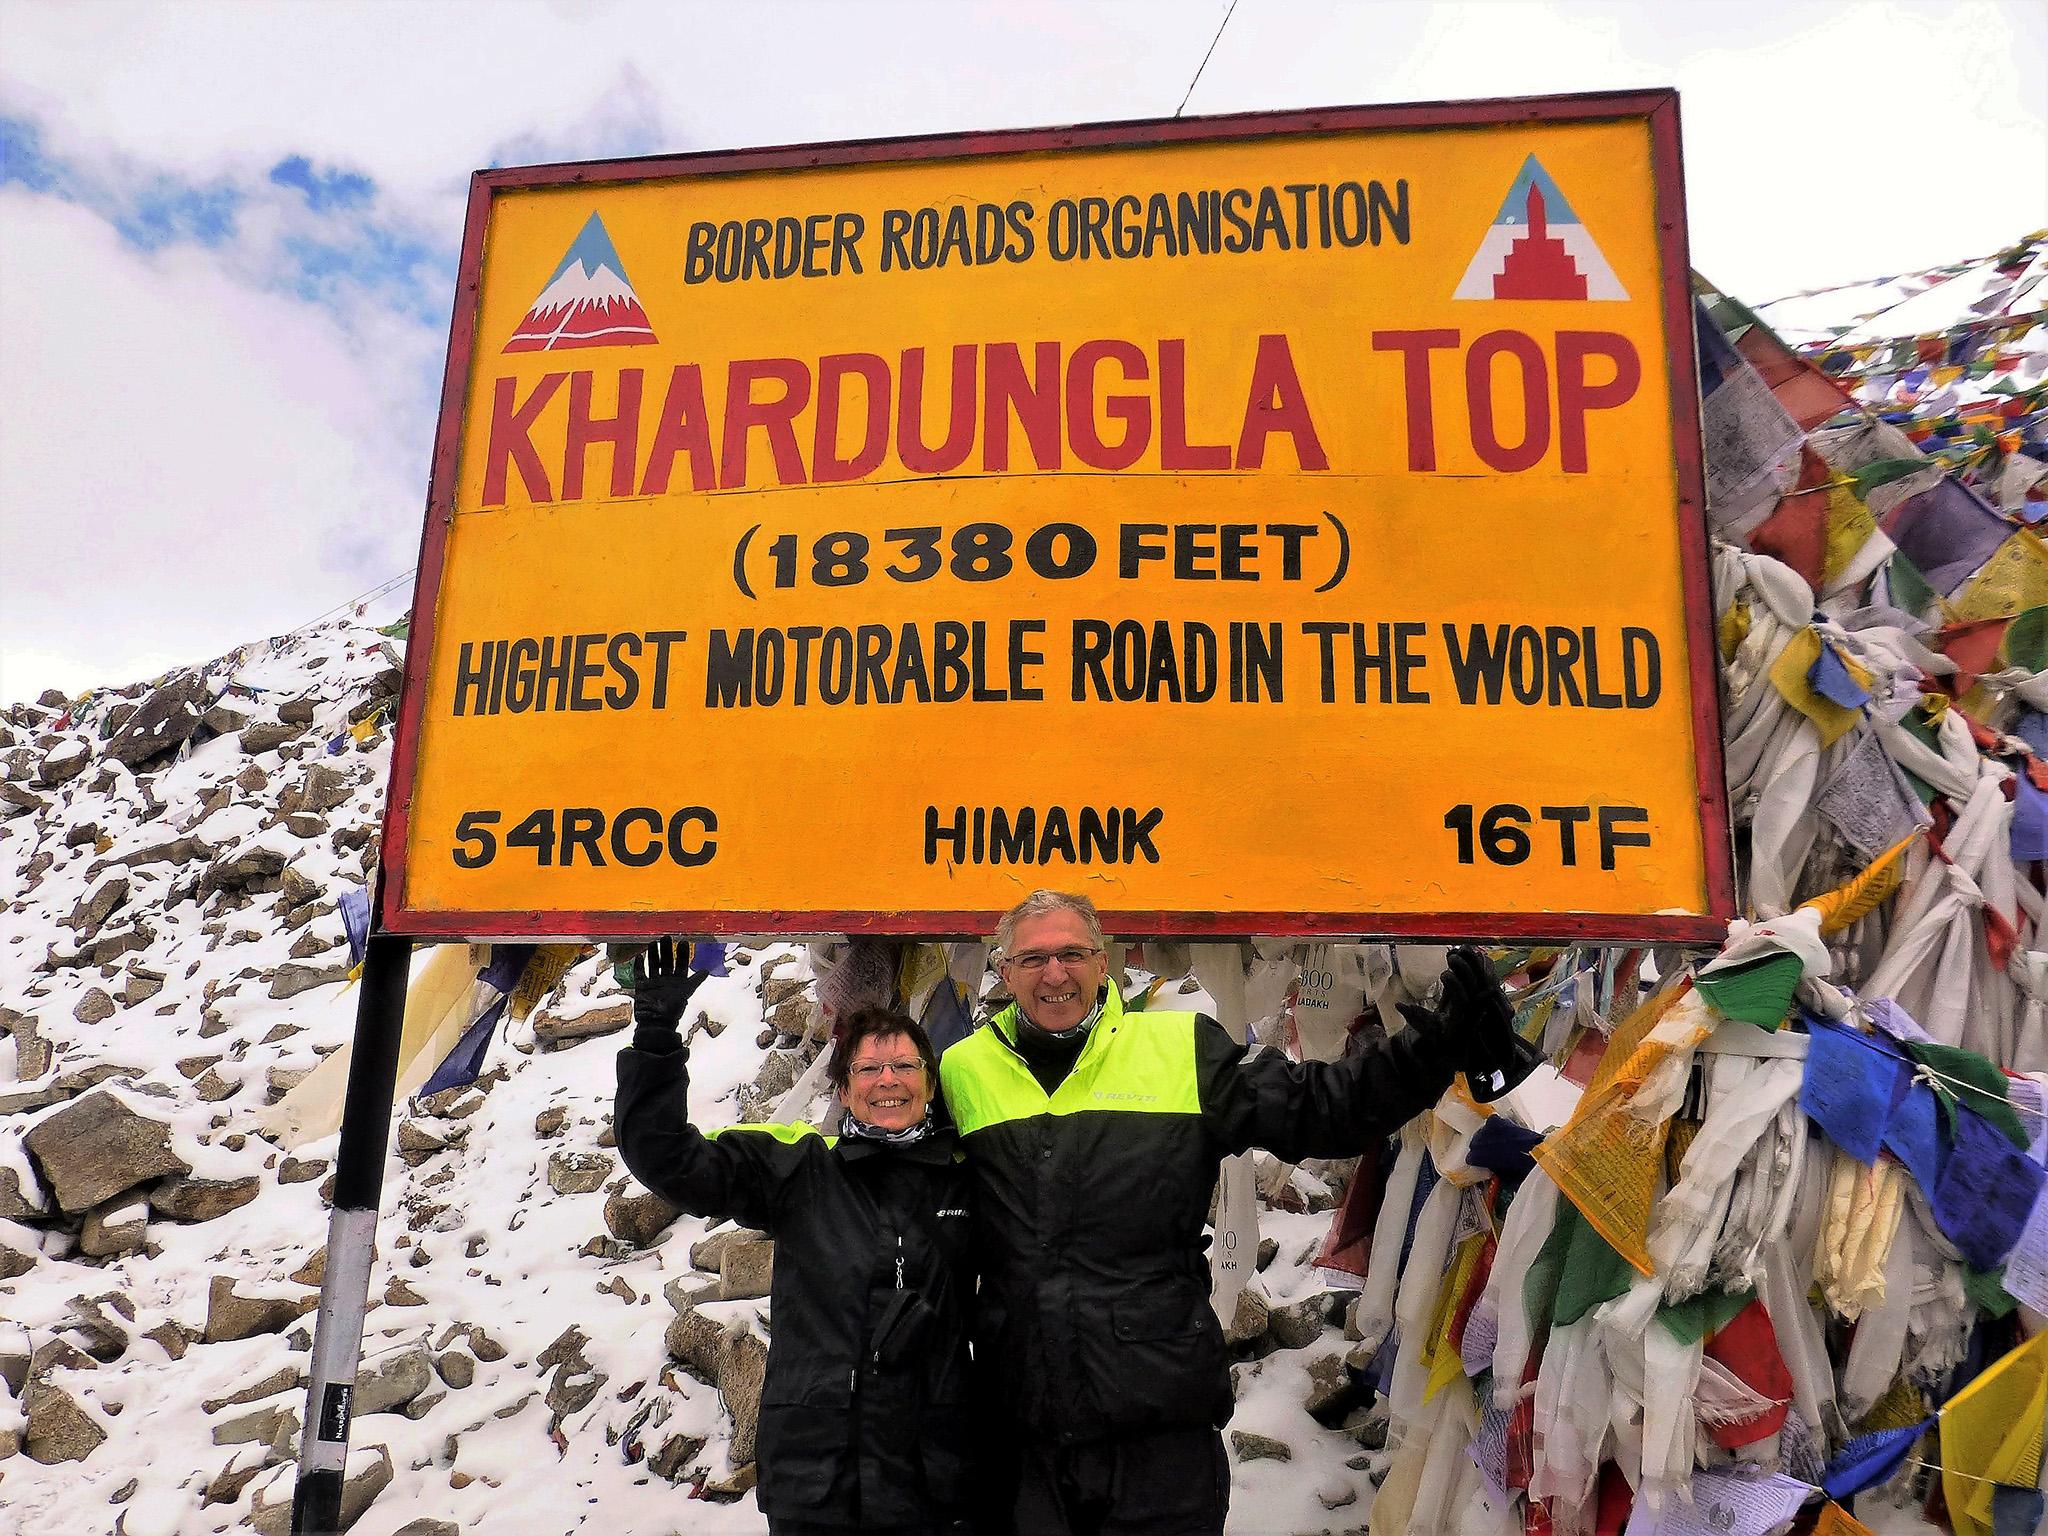 Col dans l'Himalaya